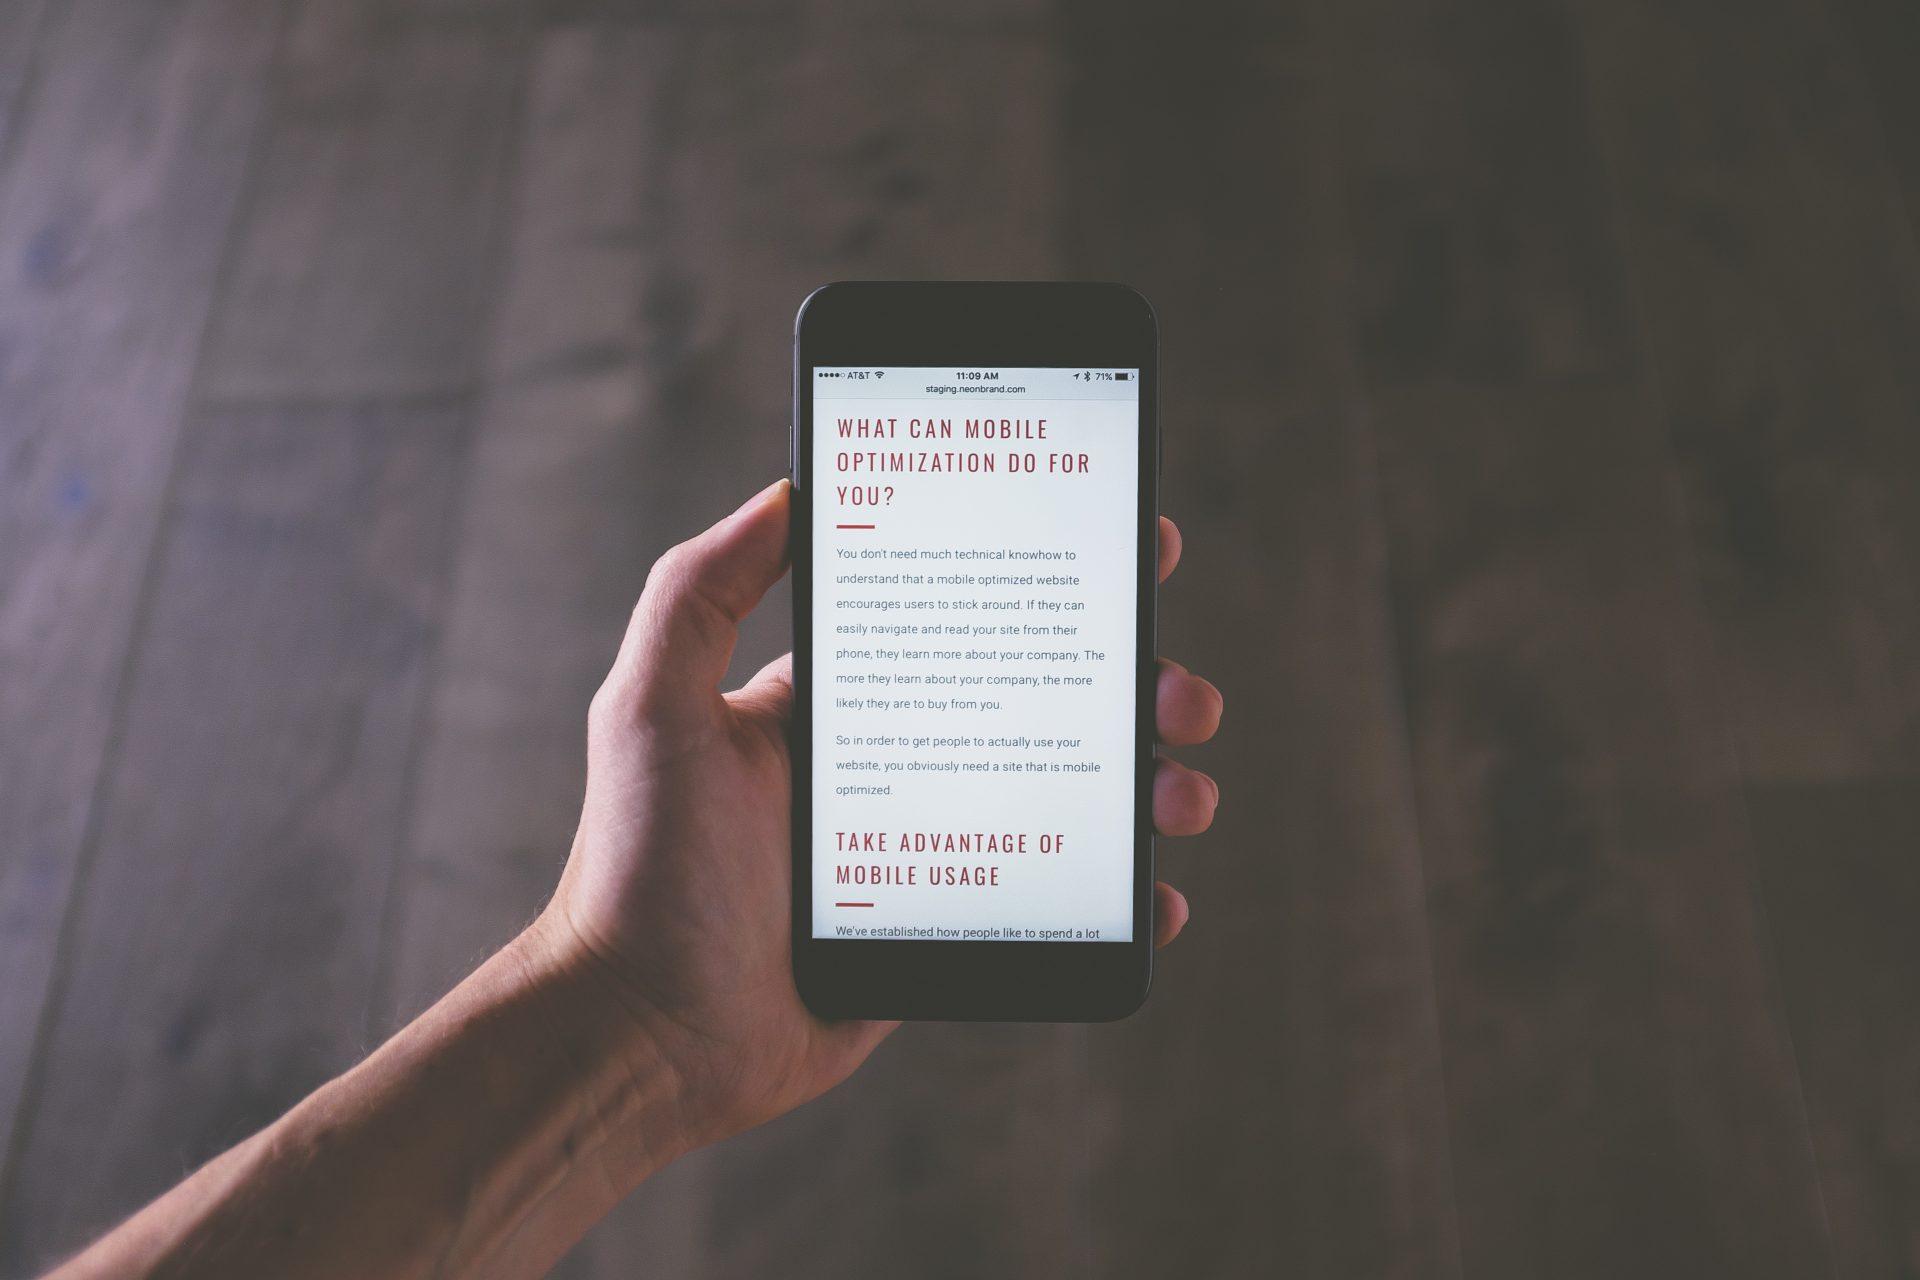 iphone-mobile-optimization